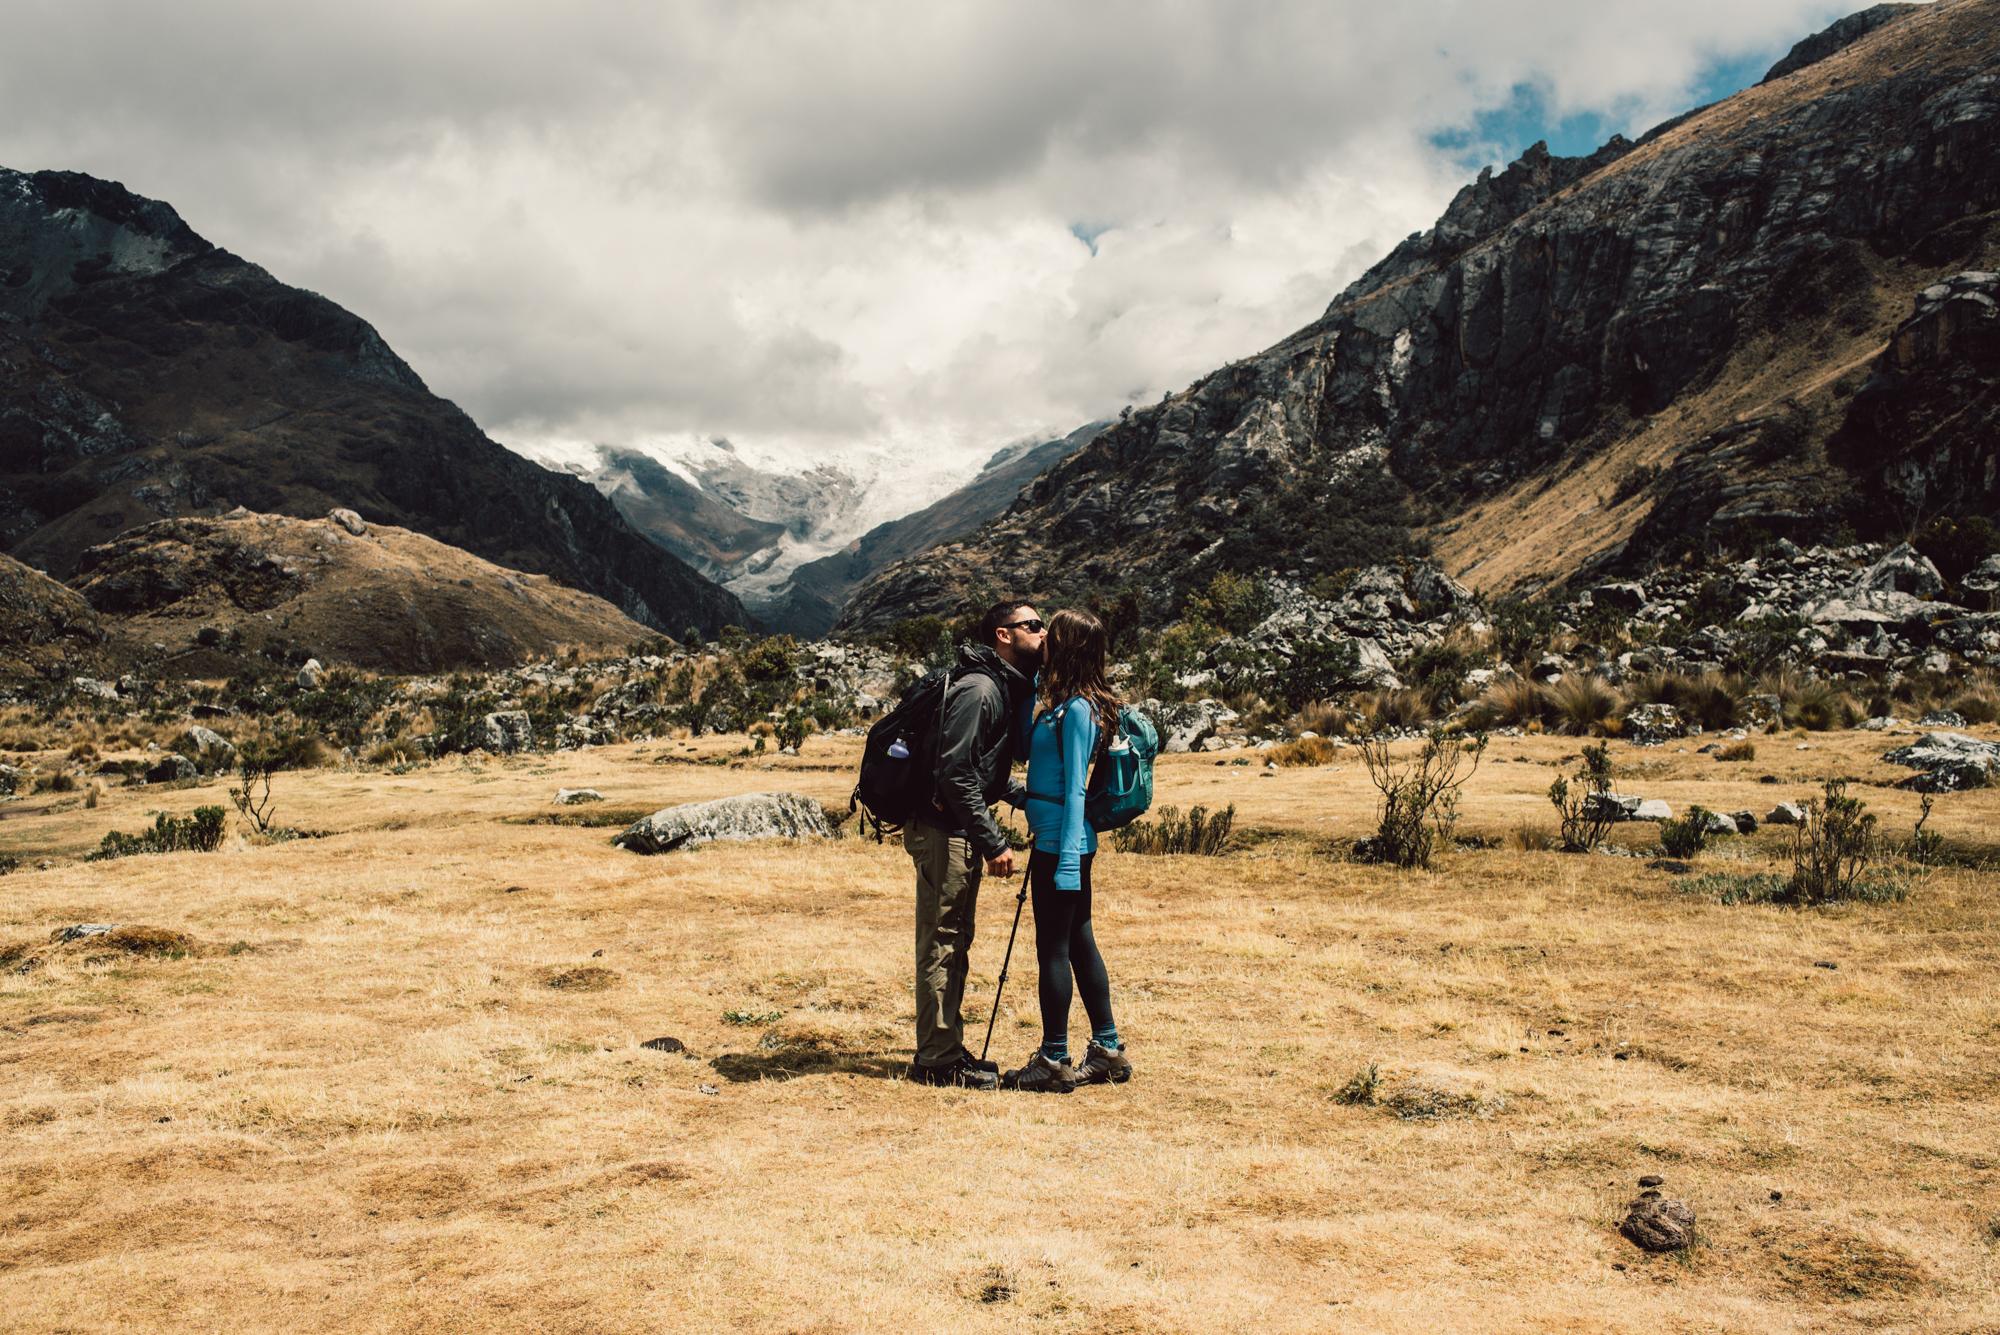 Damian and Jesse Engagement Session Huayhuash Mountain Trekking Peru_101.JPG